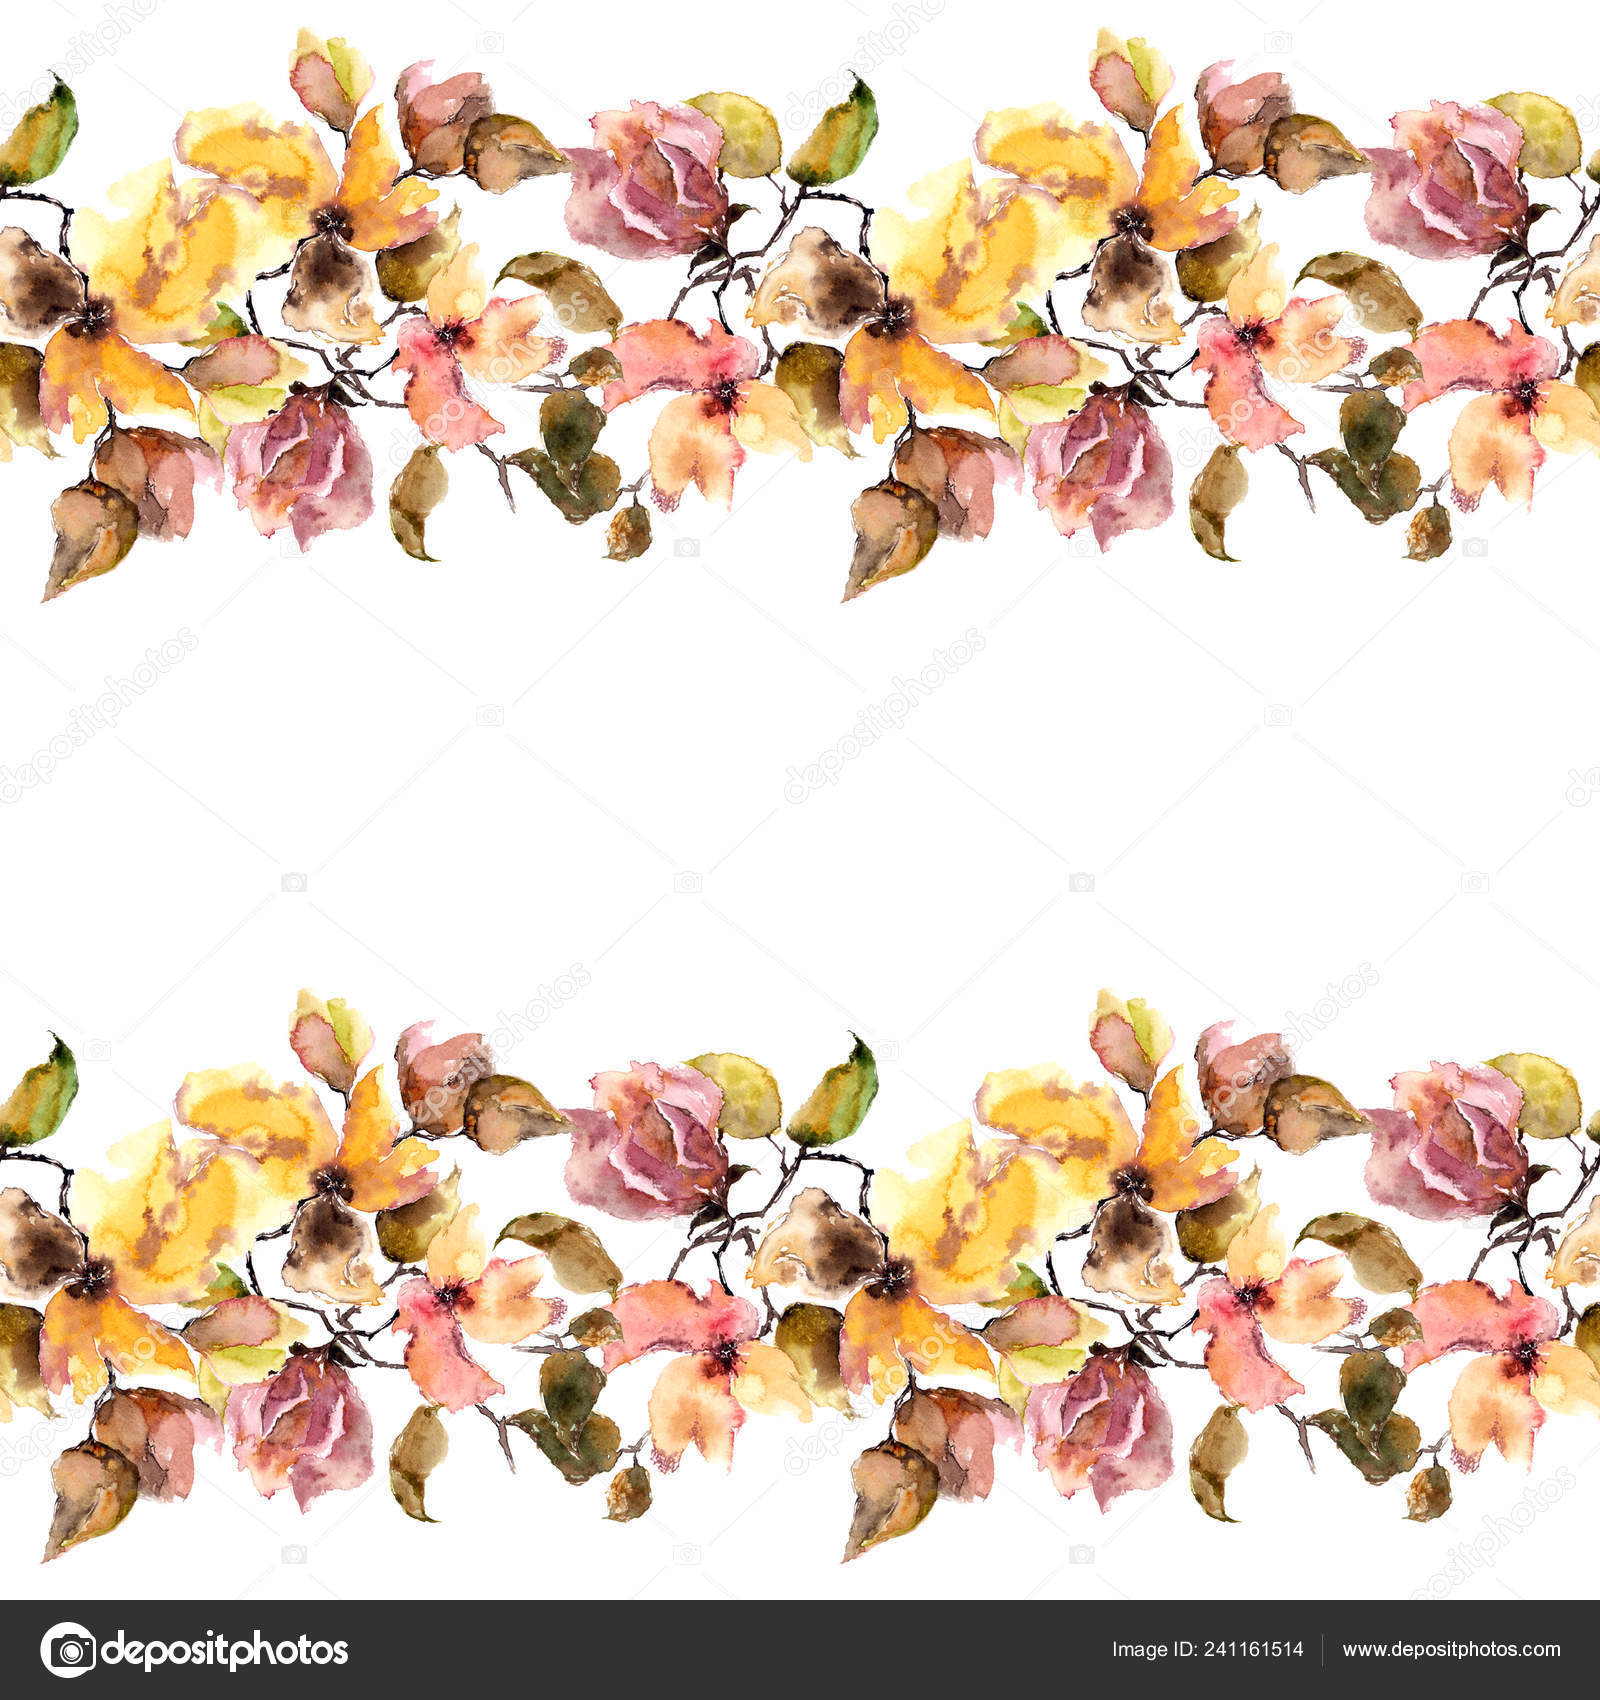 Seamless Floral Border Watercolor Floral Frame Wedding Invitation